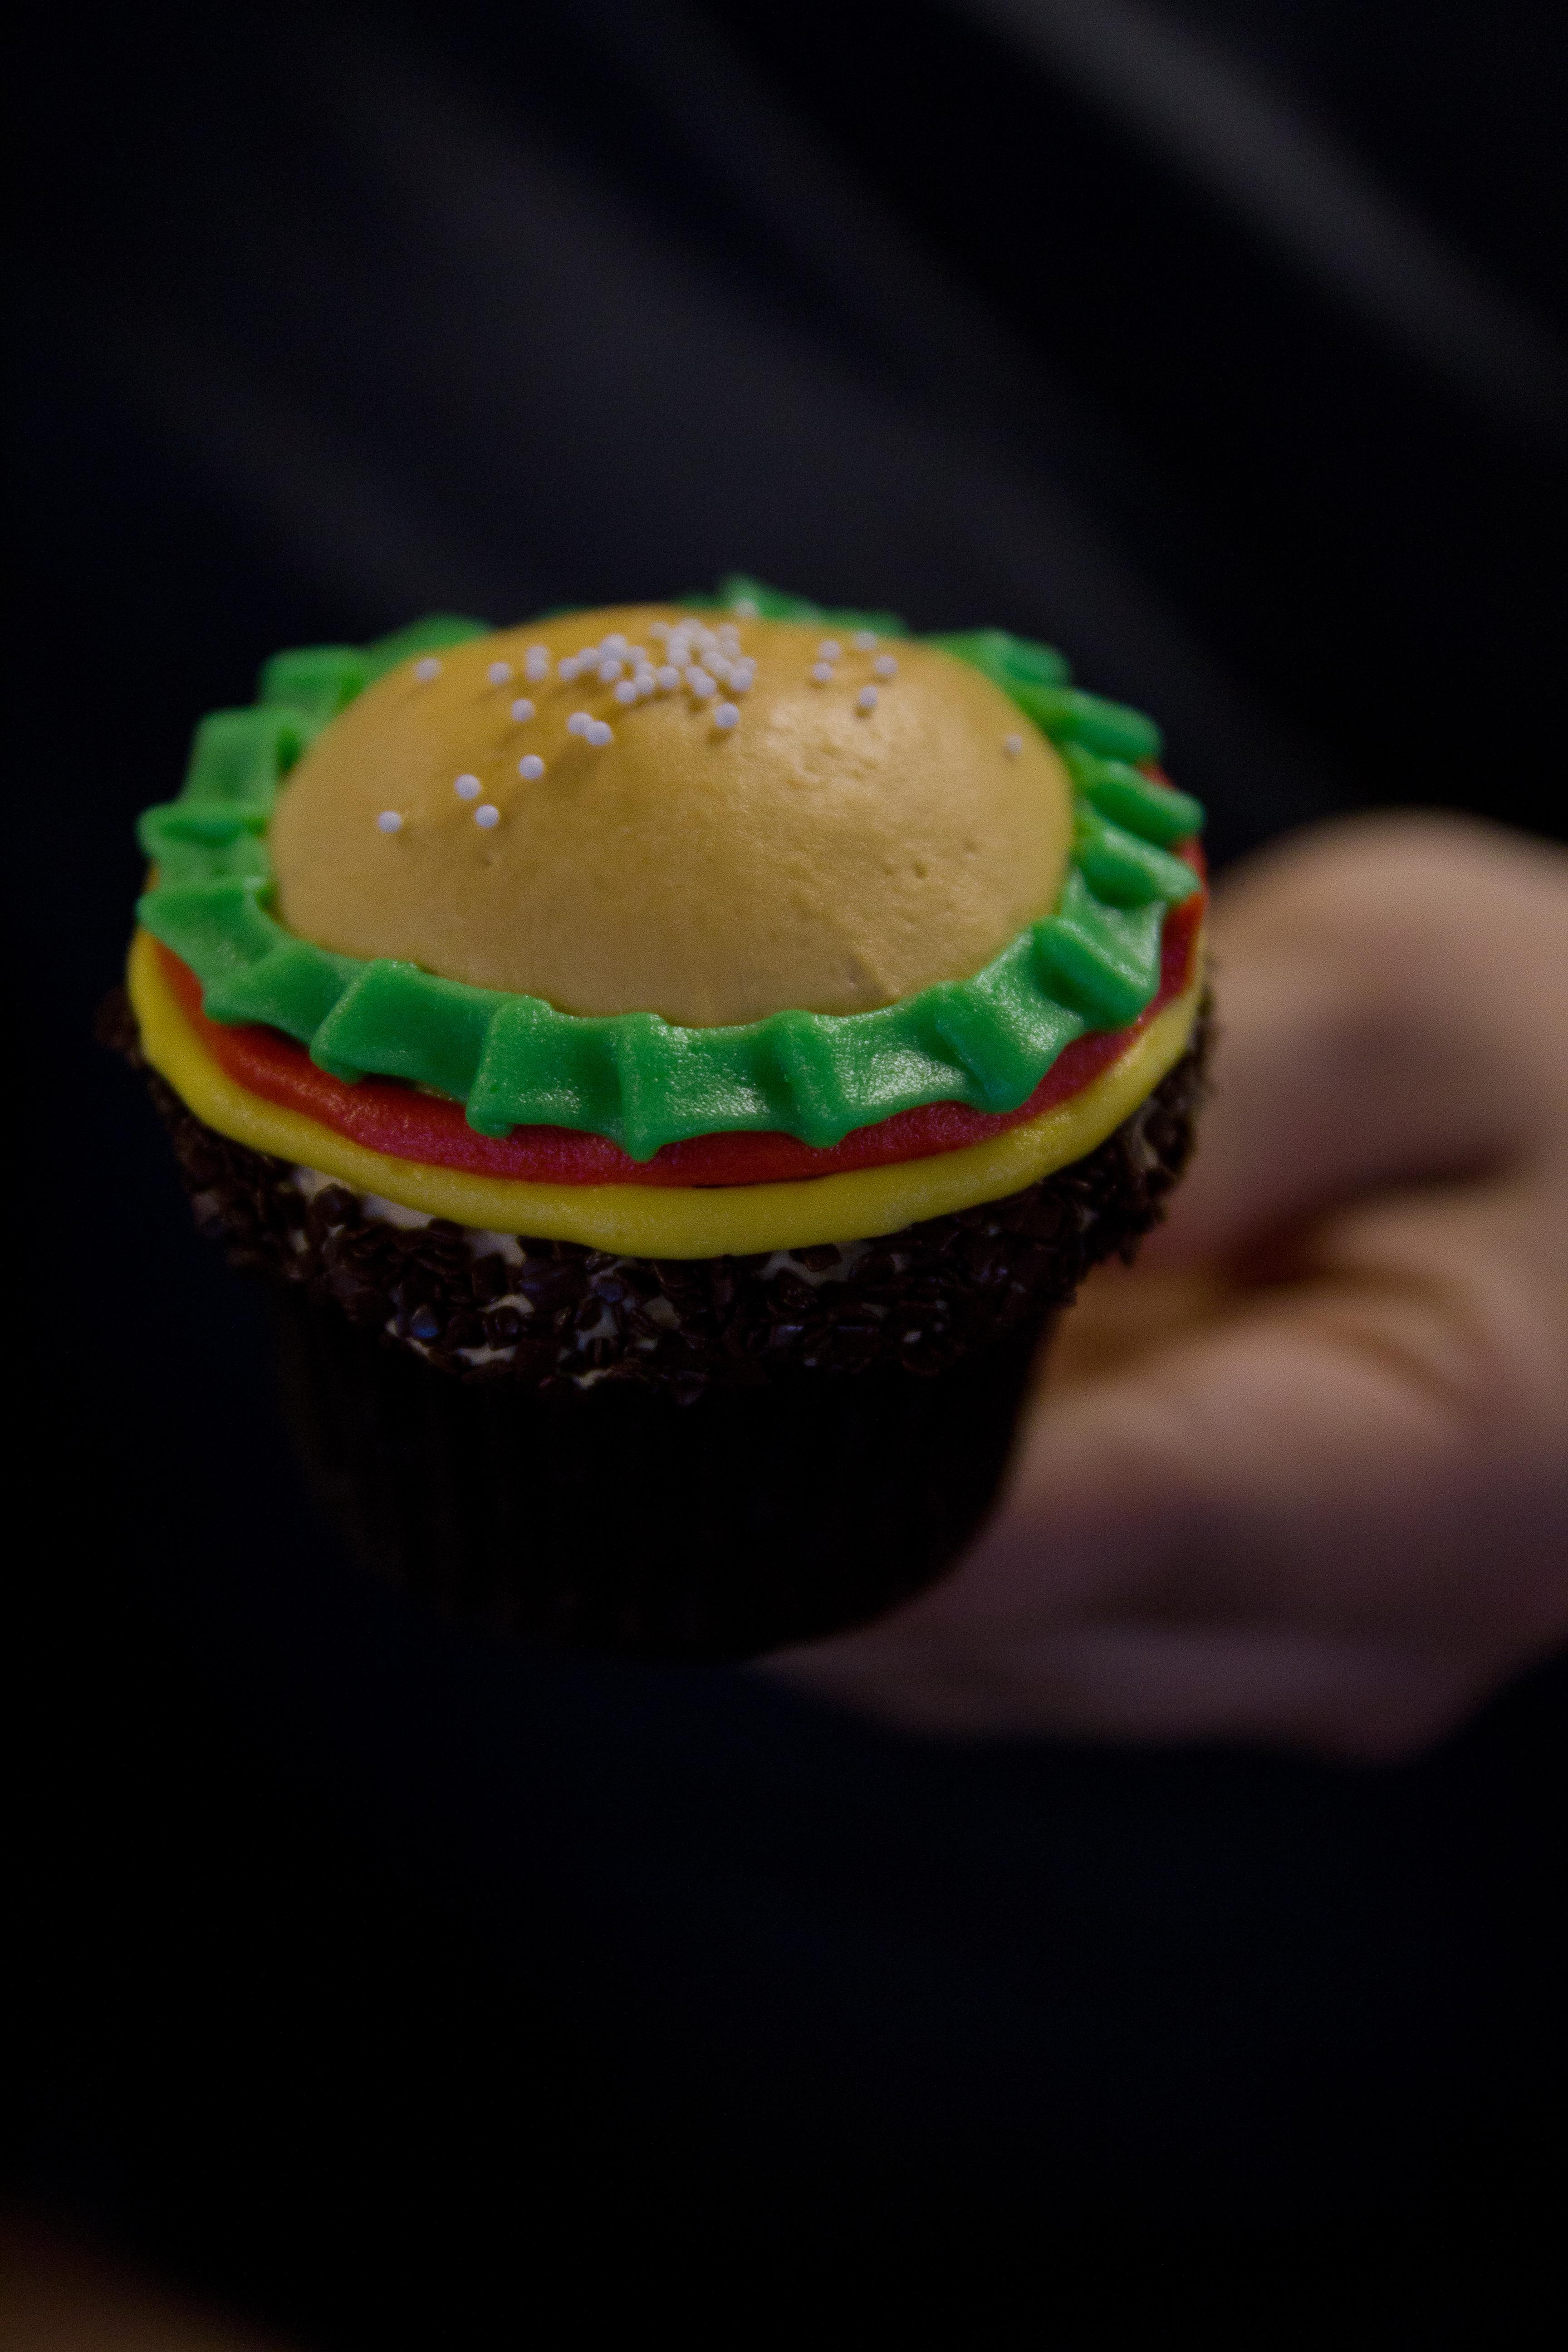 Candidate Cupcake